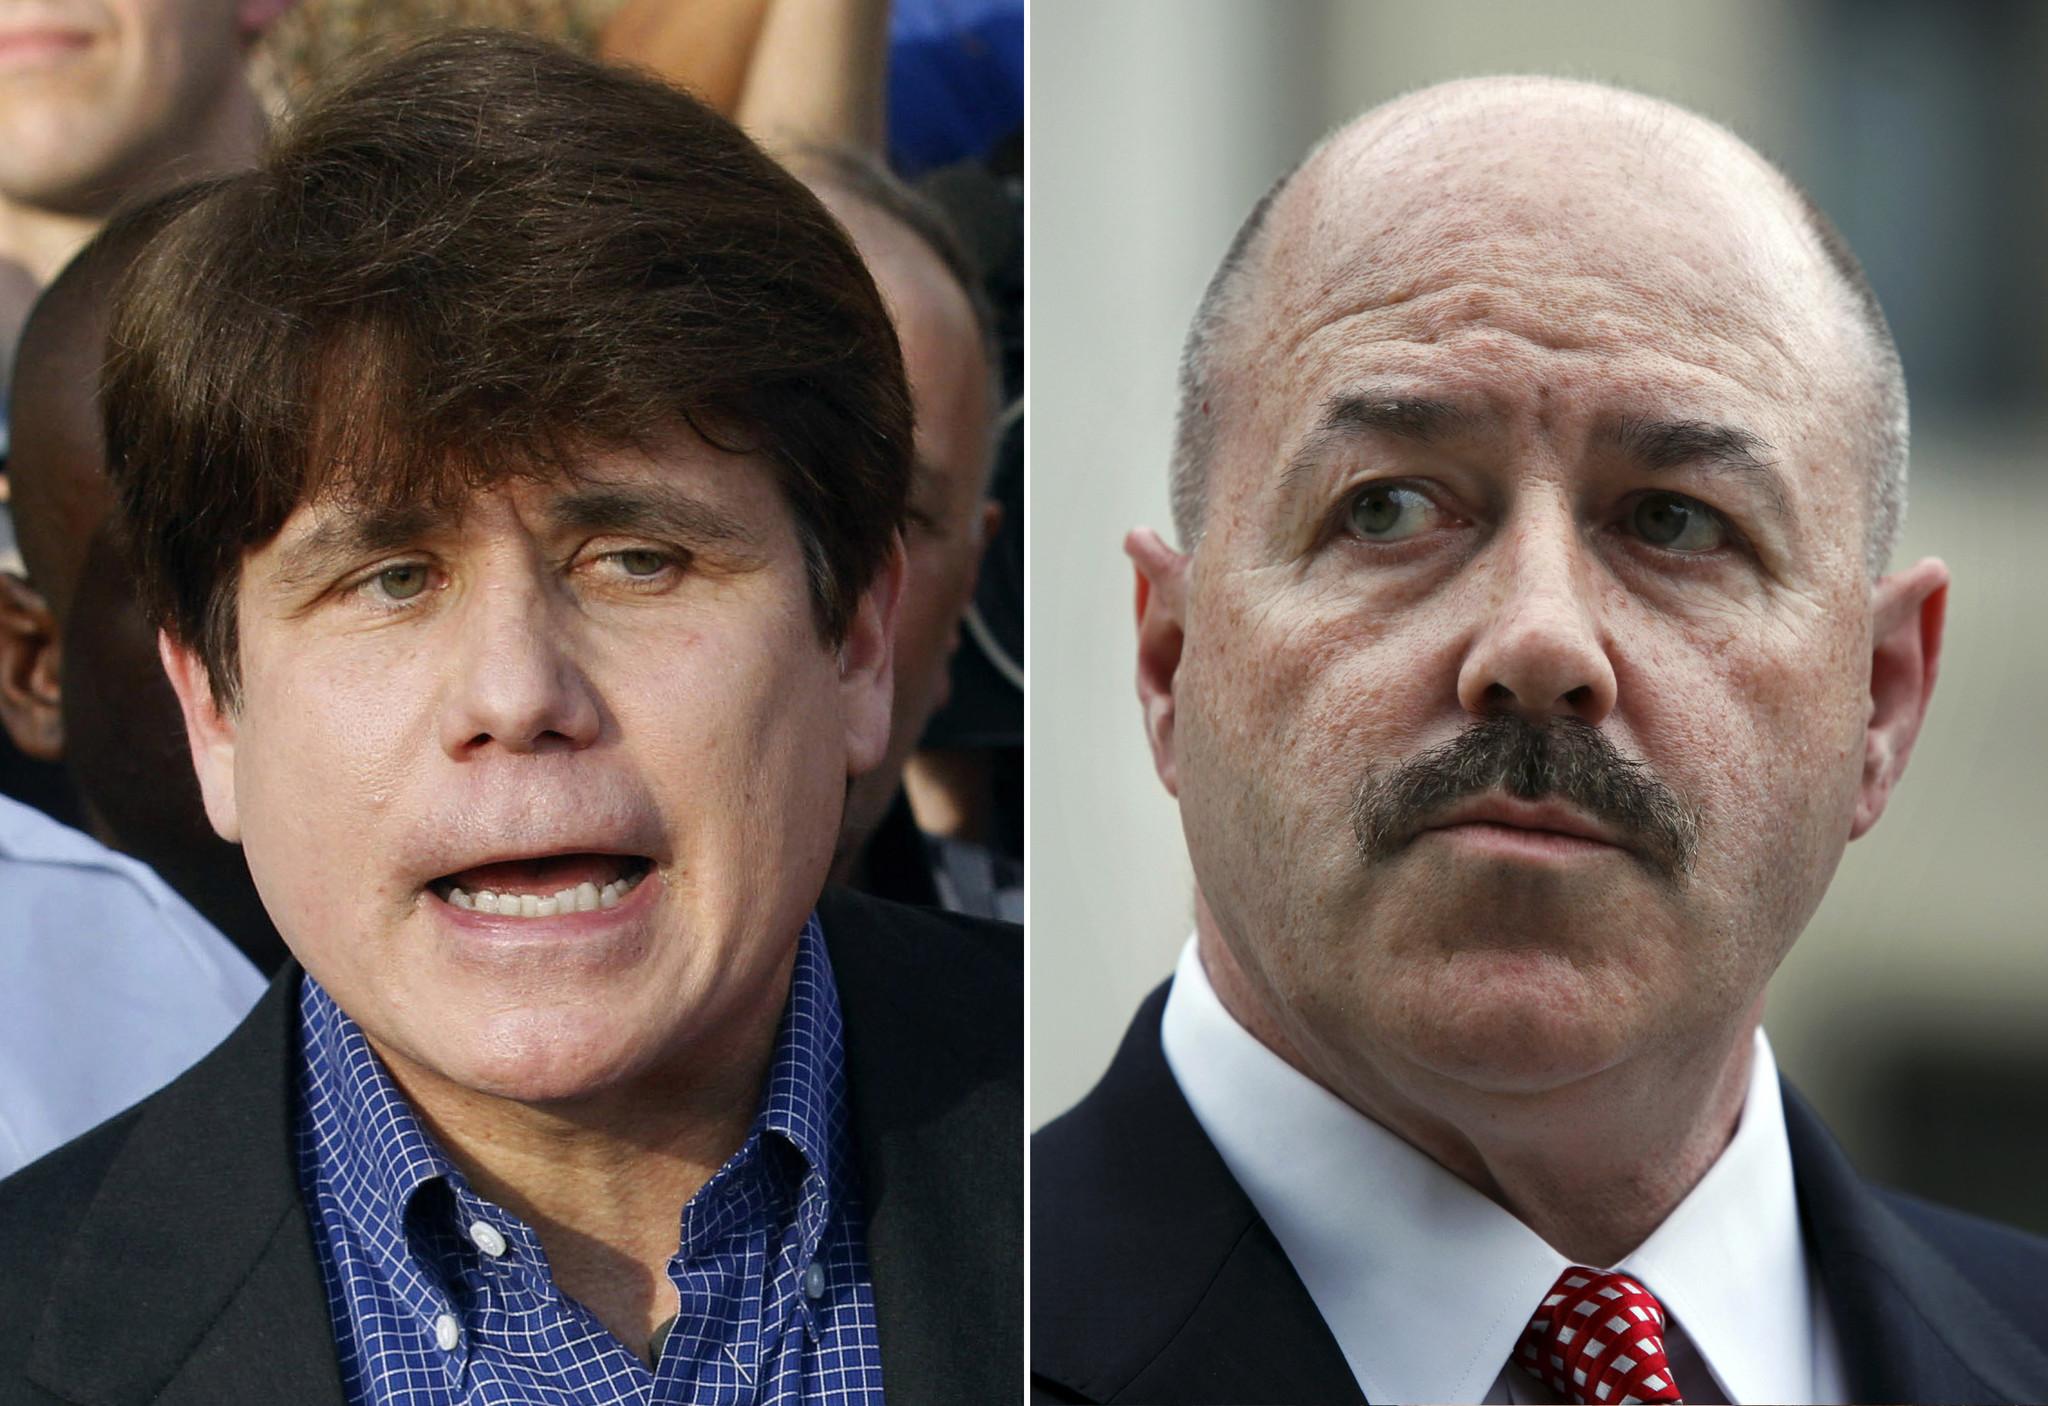 Trump pardons Rod Blagojevich and clemency for former NYPD commissioner Bernie Kerik and financier, Michael Milken